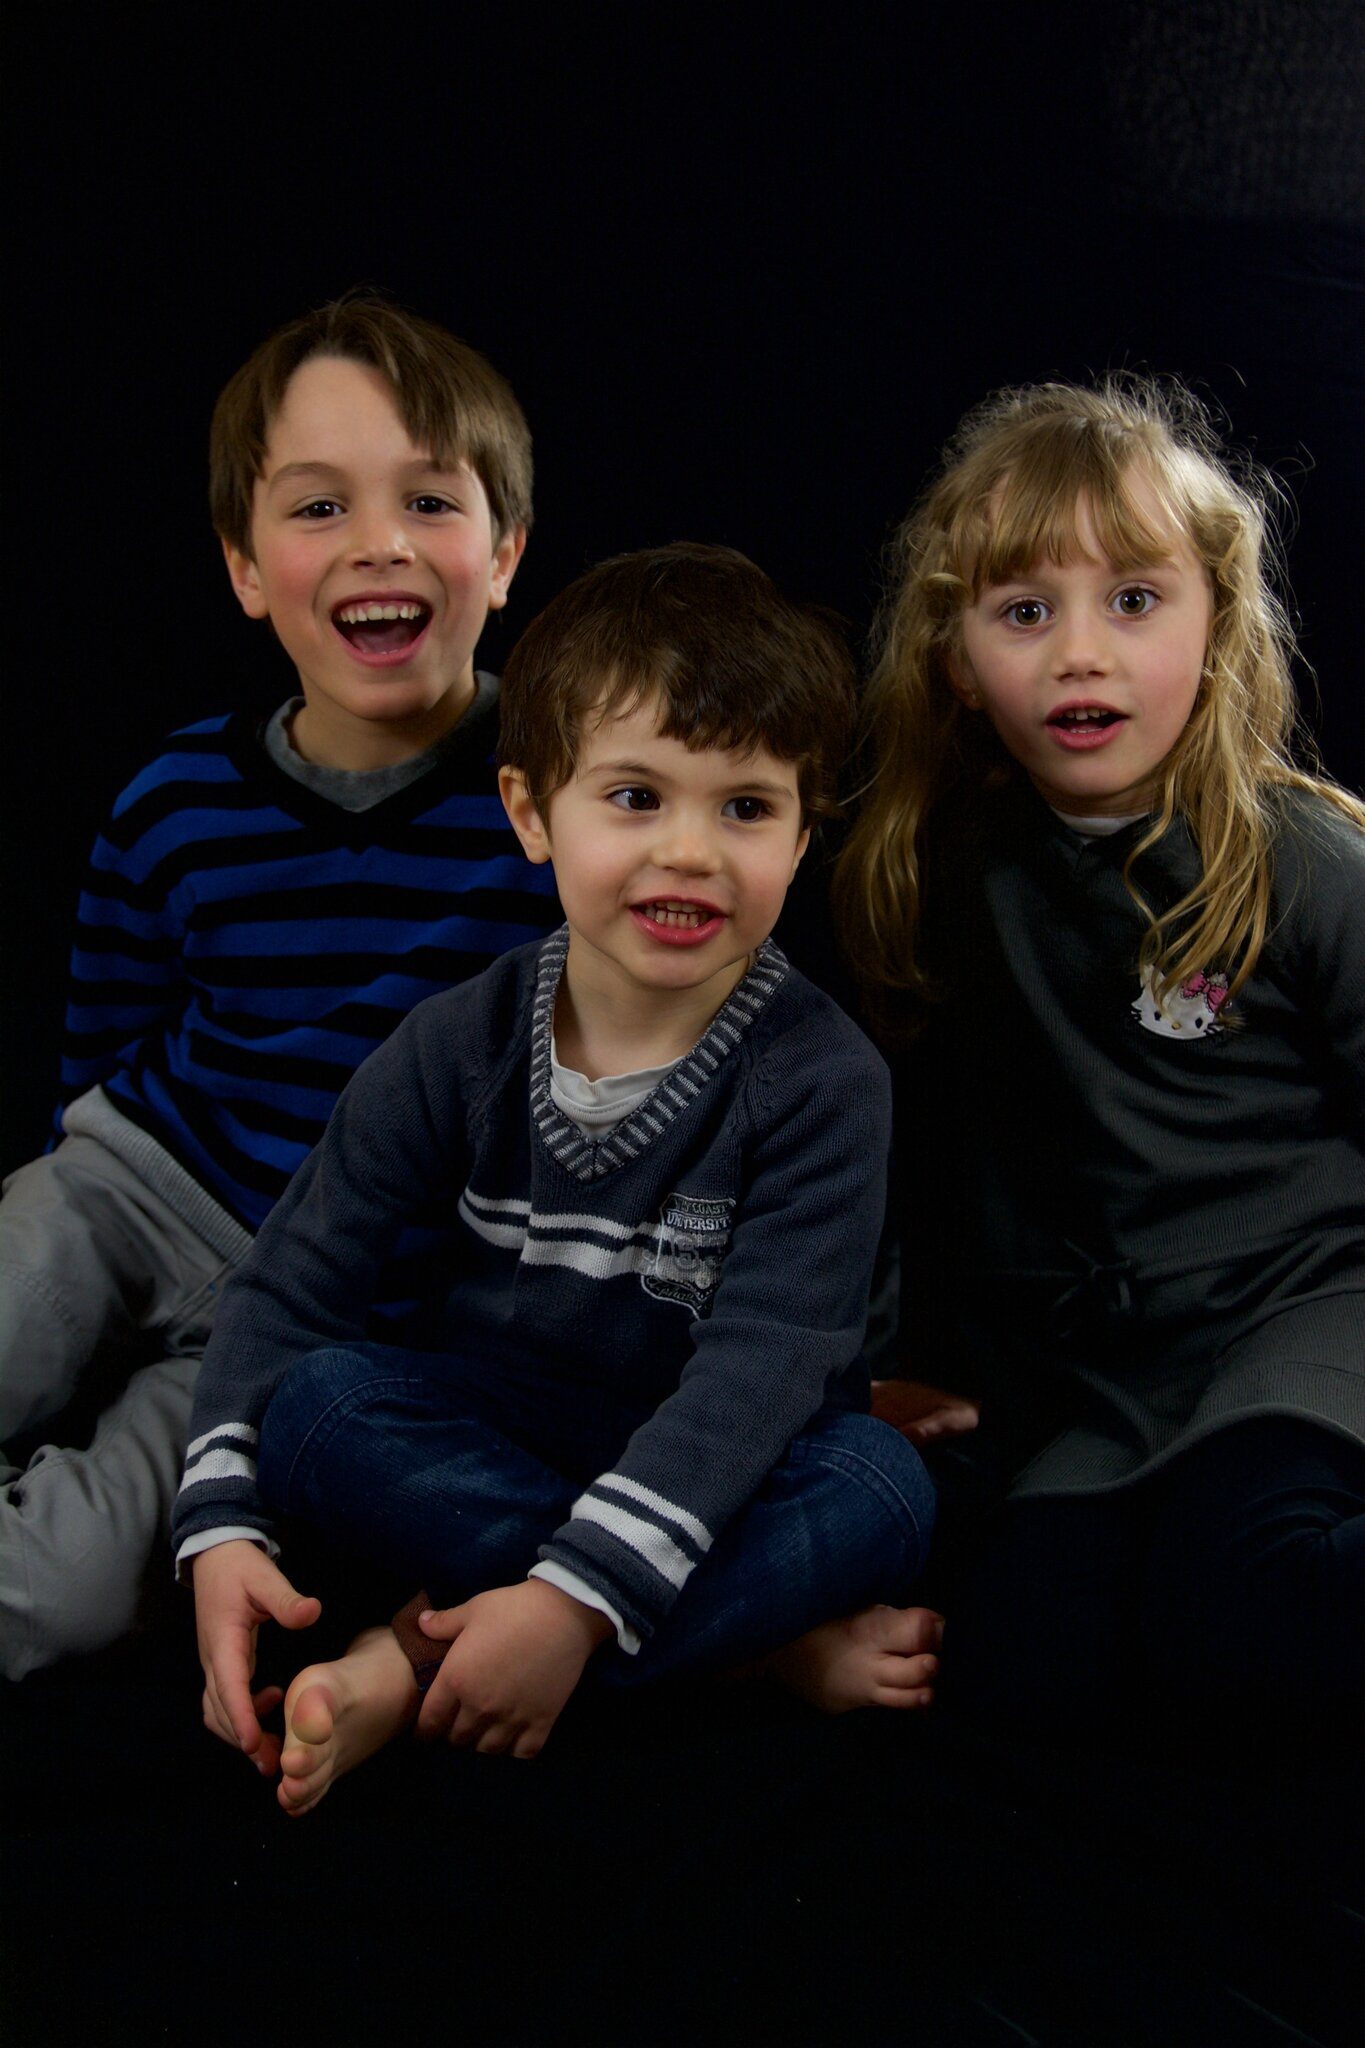 20150328-léia 5,5ans Léonis 3ans Elio 7ans 46 (1)